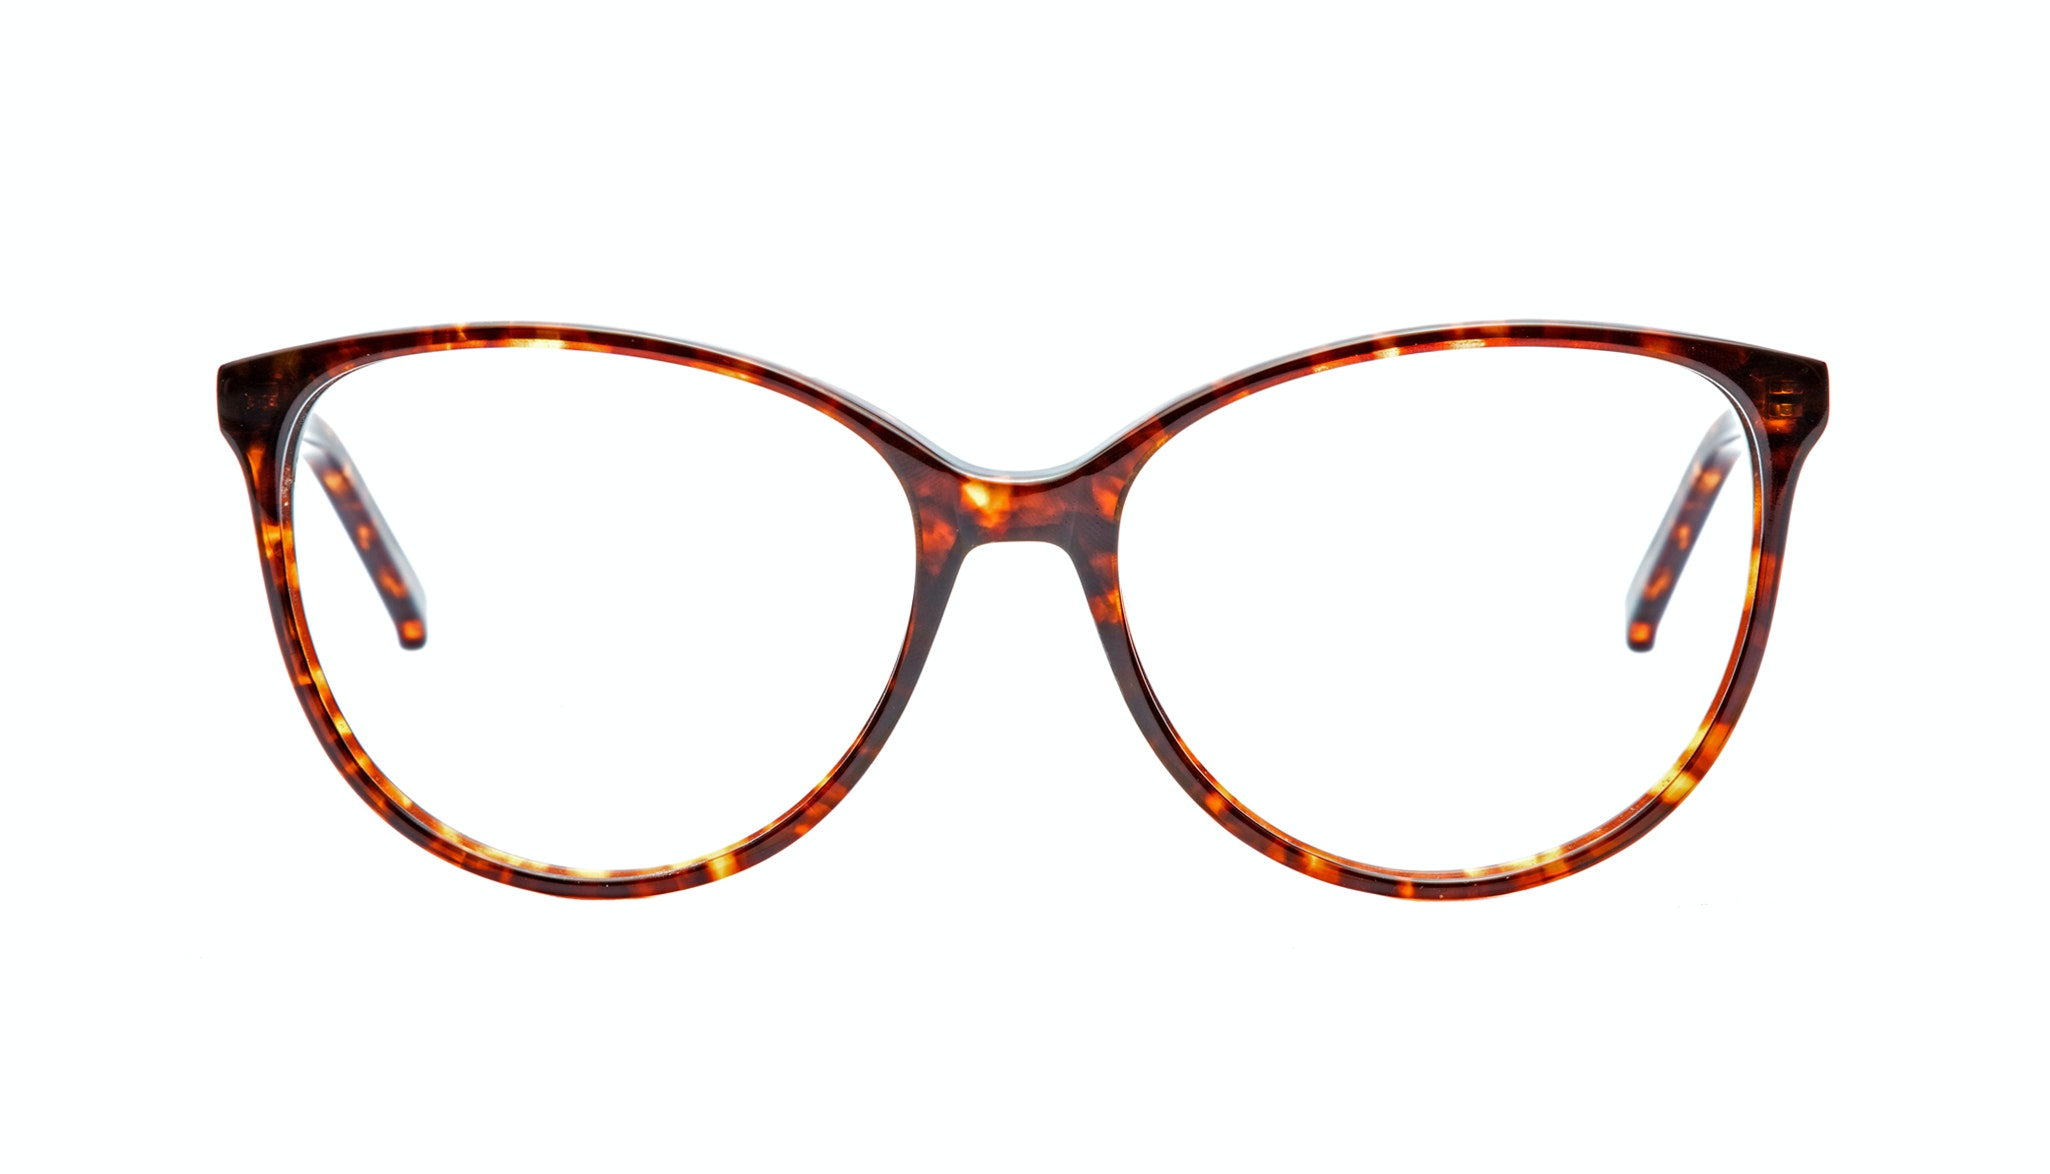 Affordable Fashion Glasses Cat Eye Round Eyeglasses Women Imagine Sepia Kiss Front